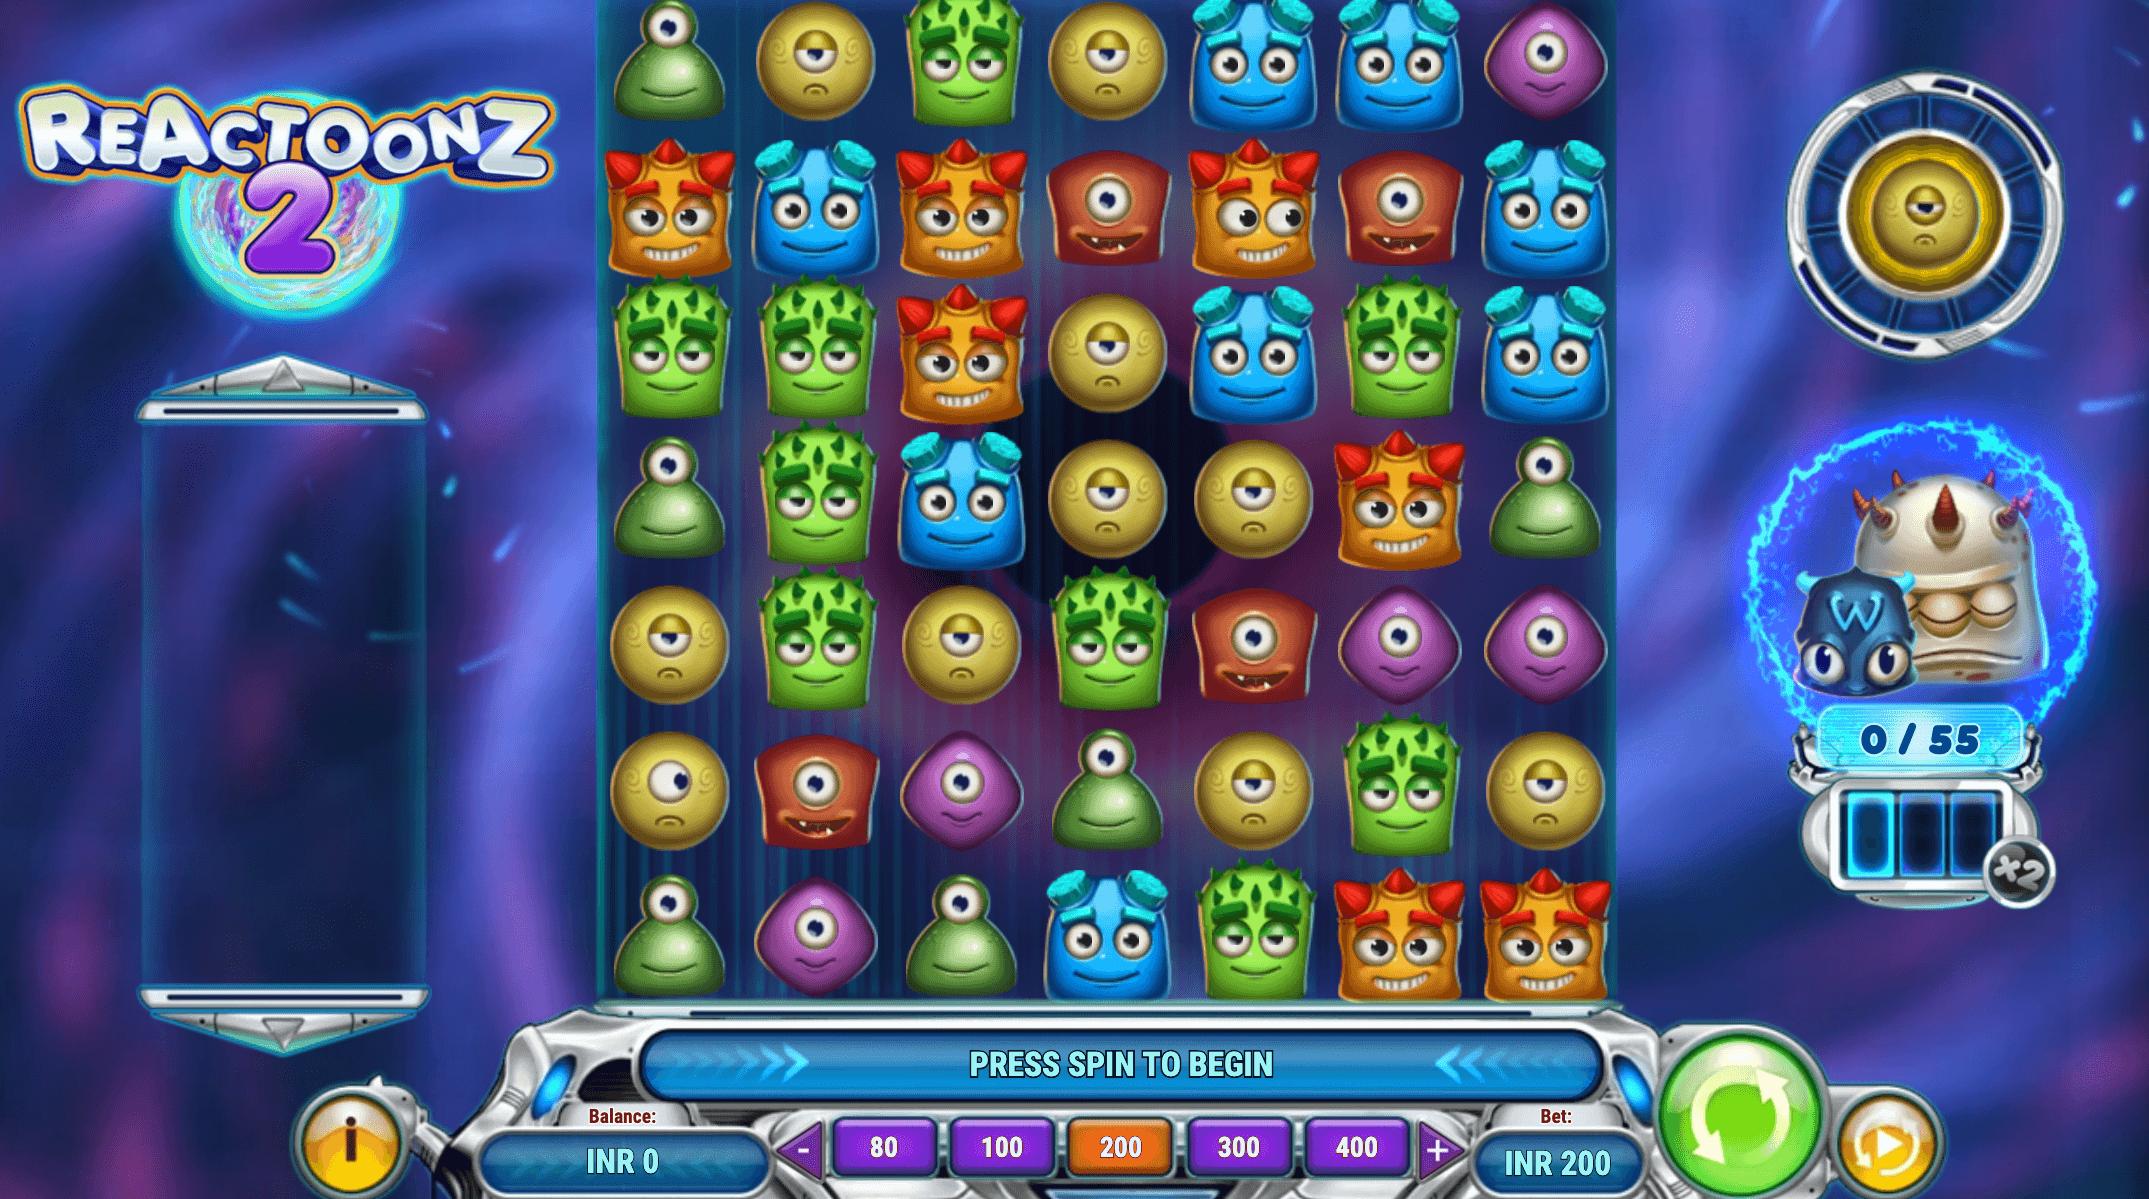 cluster-pay-screenshot-of-reactoonz-2-slot